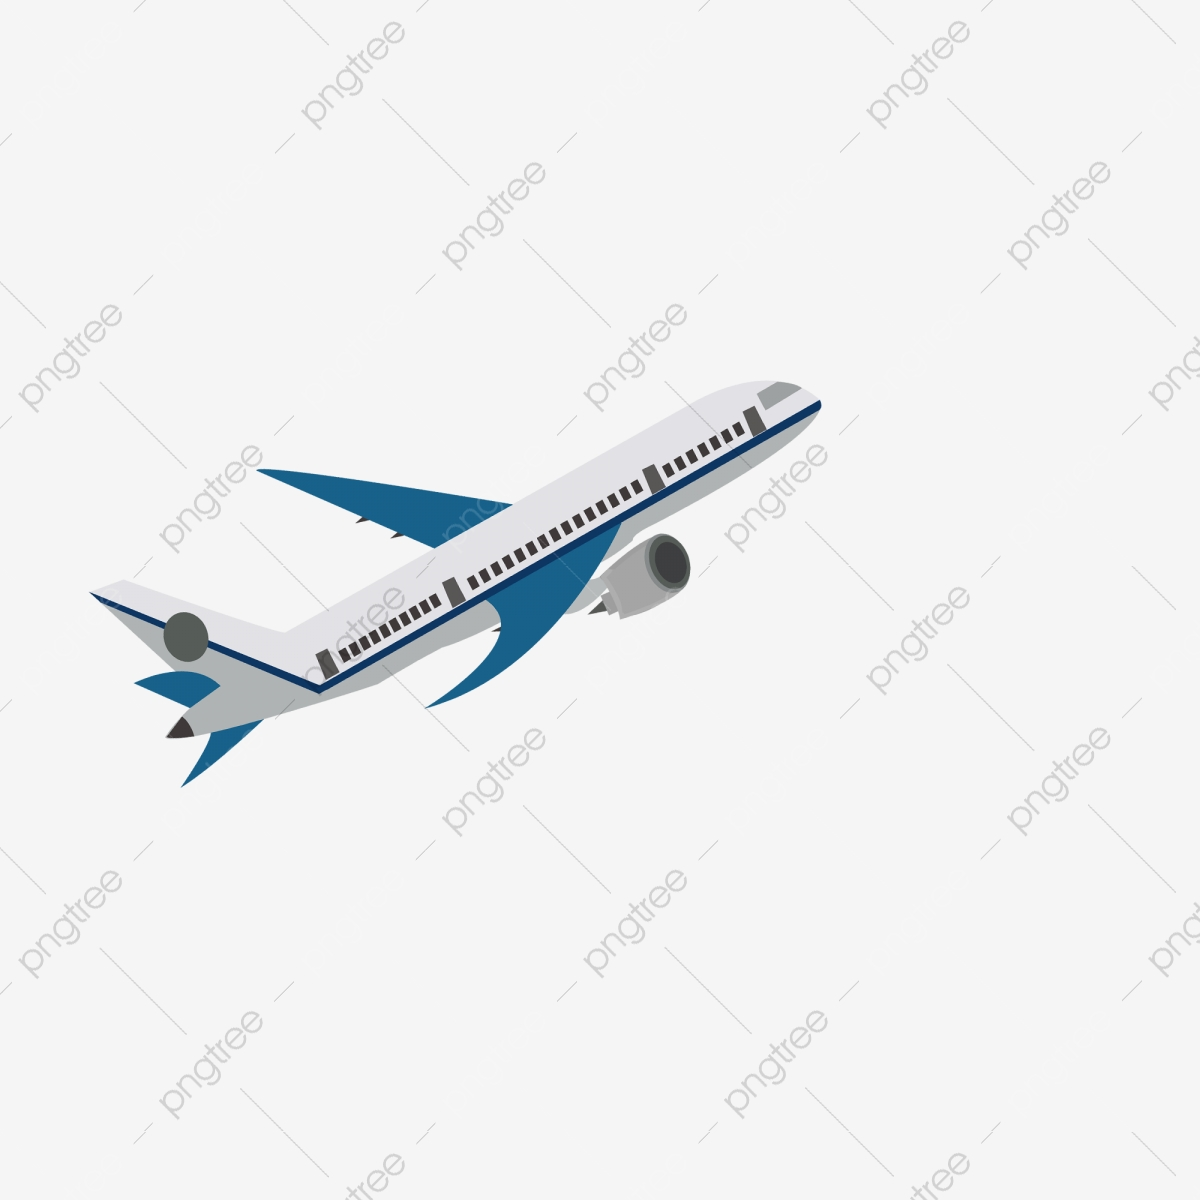 Cartoon Flying Airplane Free Illustration Airplane